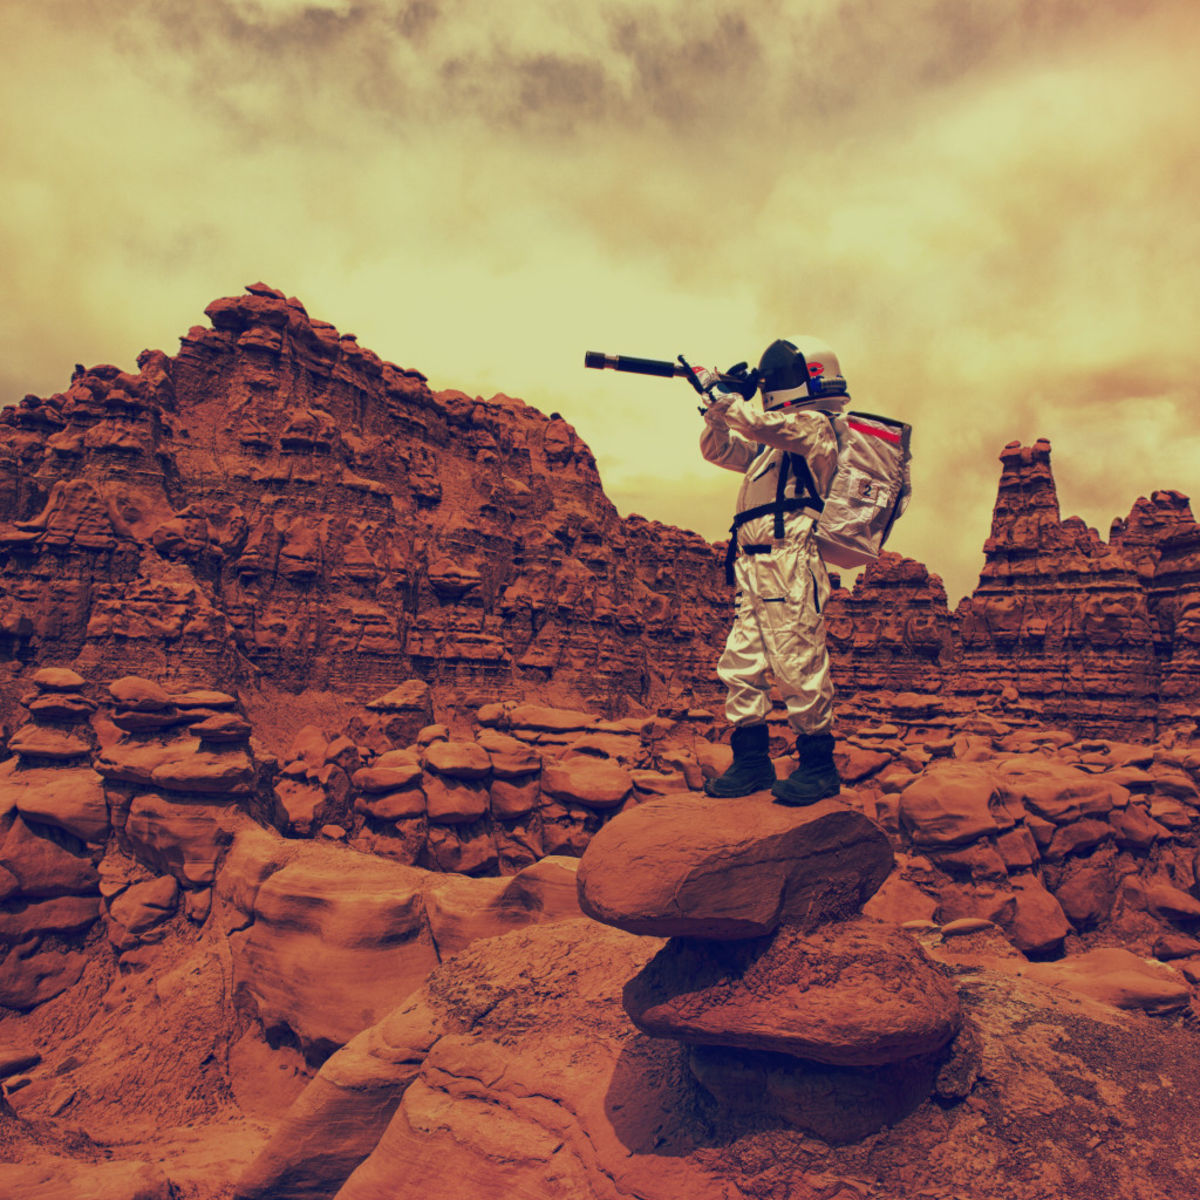 o-MARS-ONE-COLONY-PROJECT-facebook_0.jpg